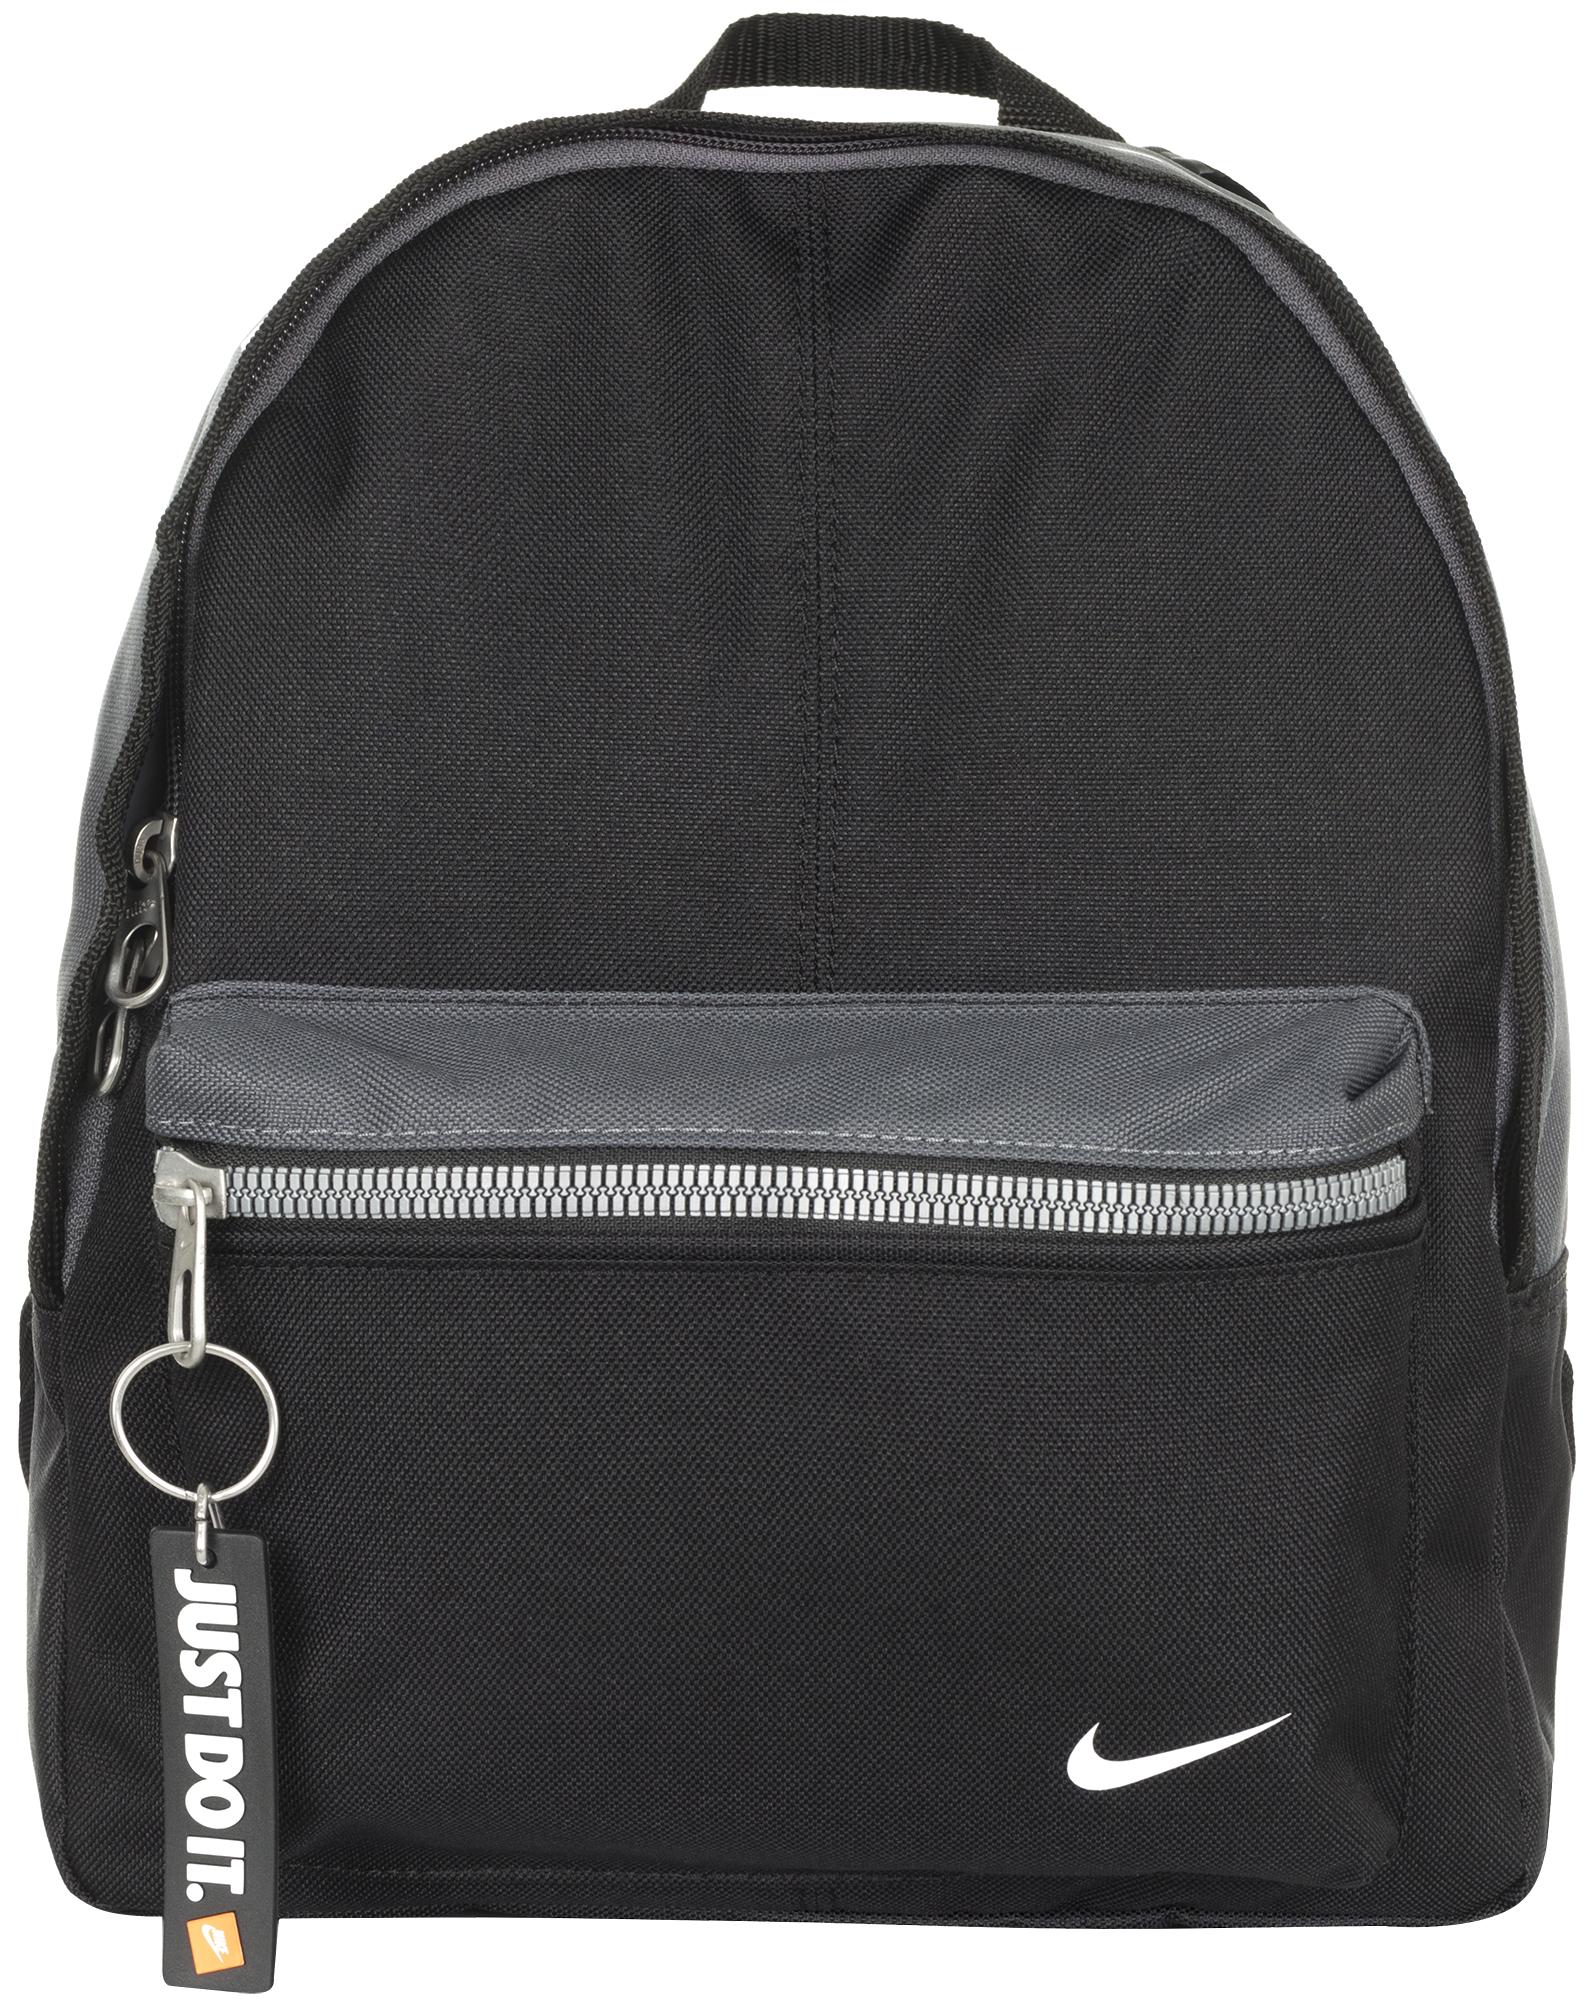 Nike Рюкзак Nike Classic, размер Без размера рюкзак детский nike brasilia backpack ba5473 480